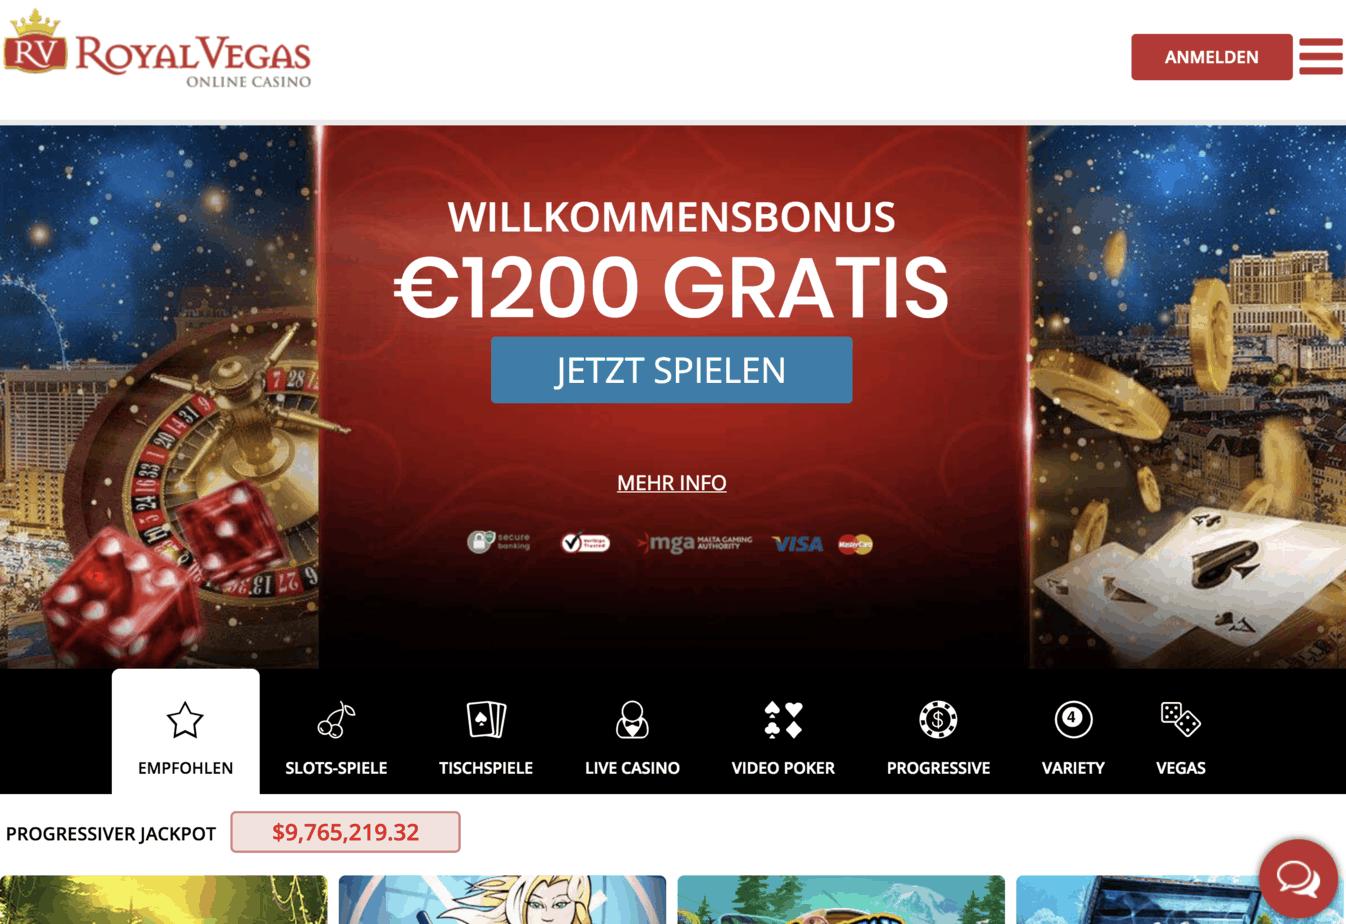 Royal Vegas Casino Homepage Screenshot